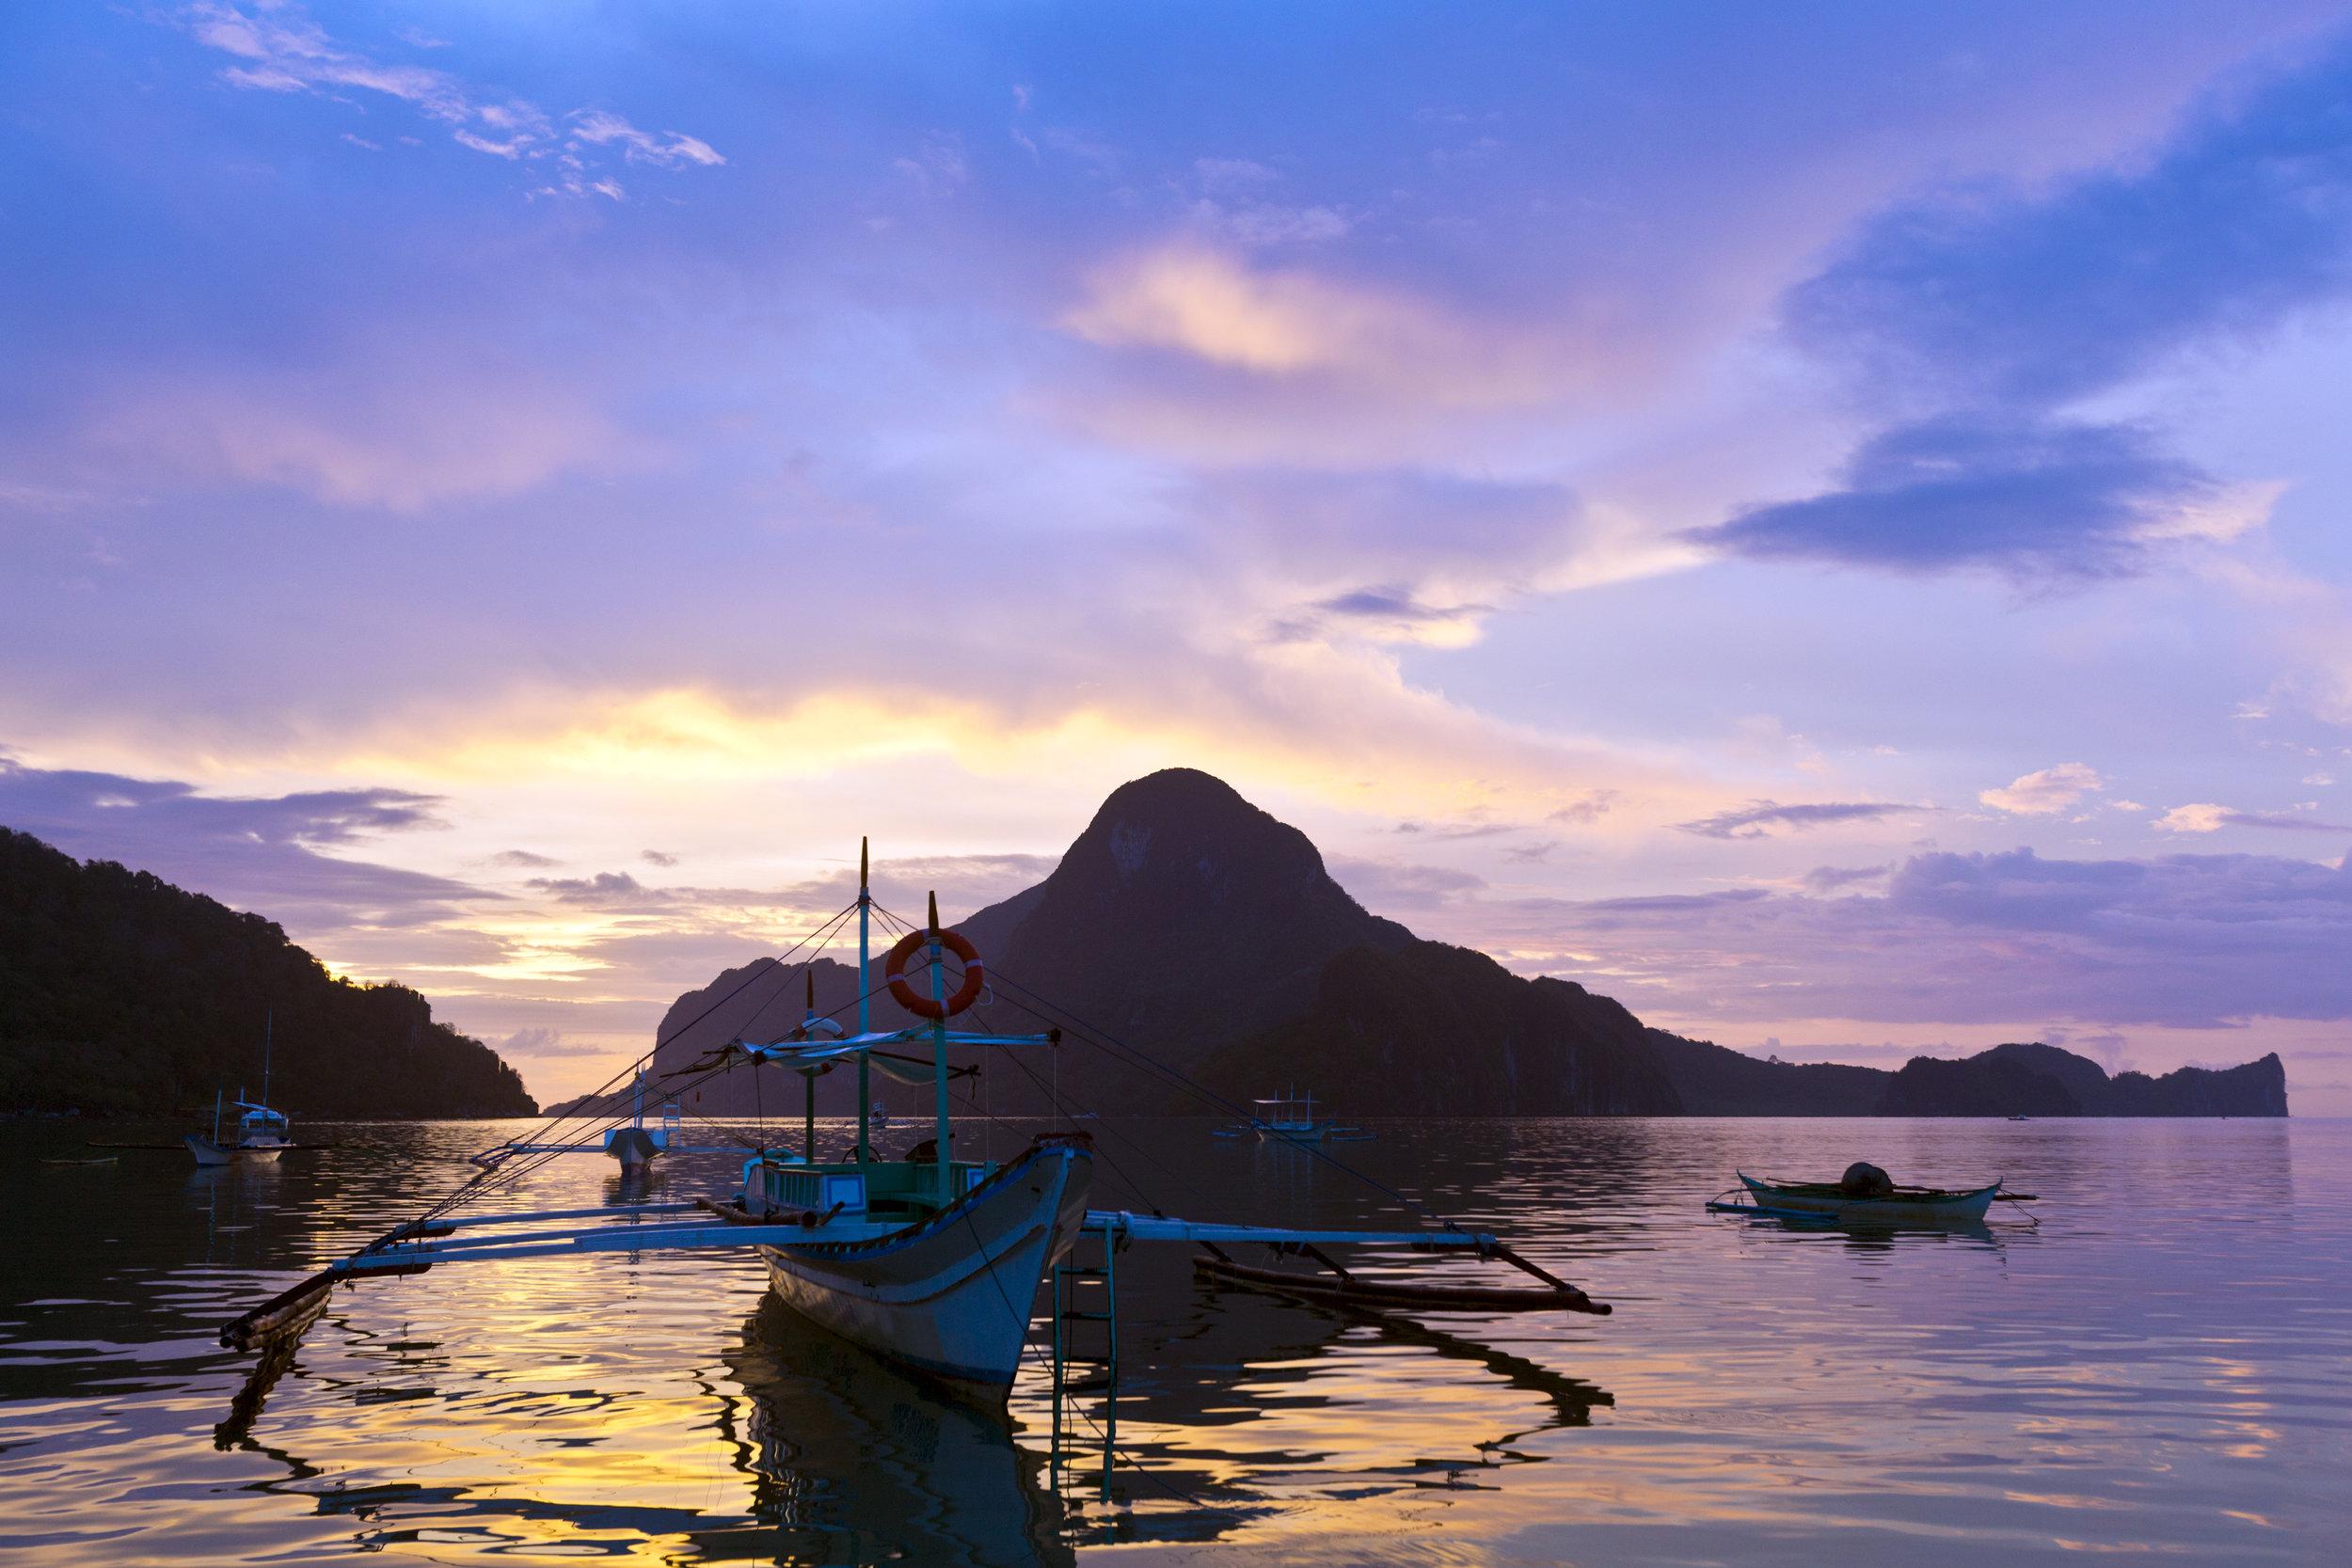 The-Philippines,-Palawan-Province,-El-Nido.-181853021_4200x2800.jpeg